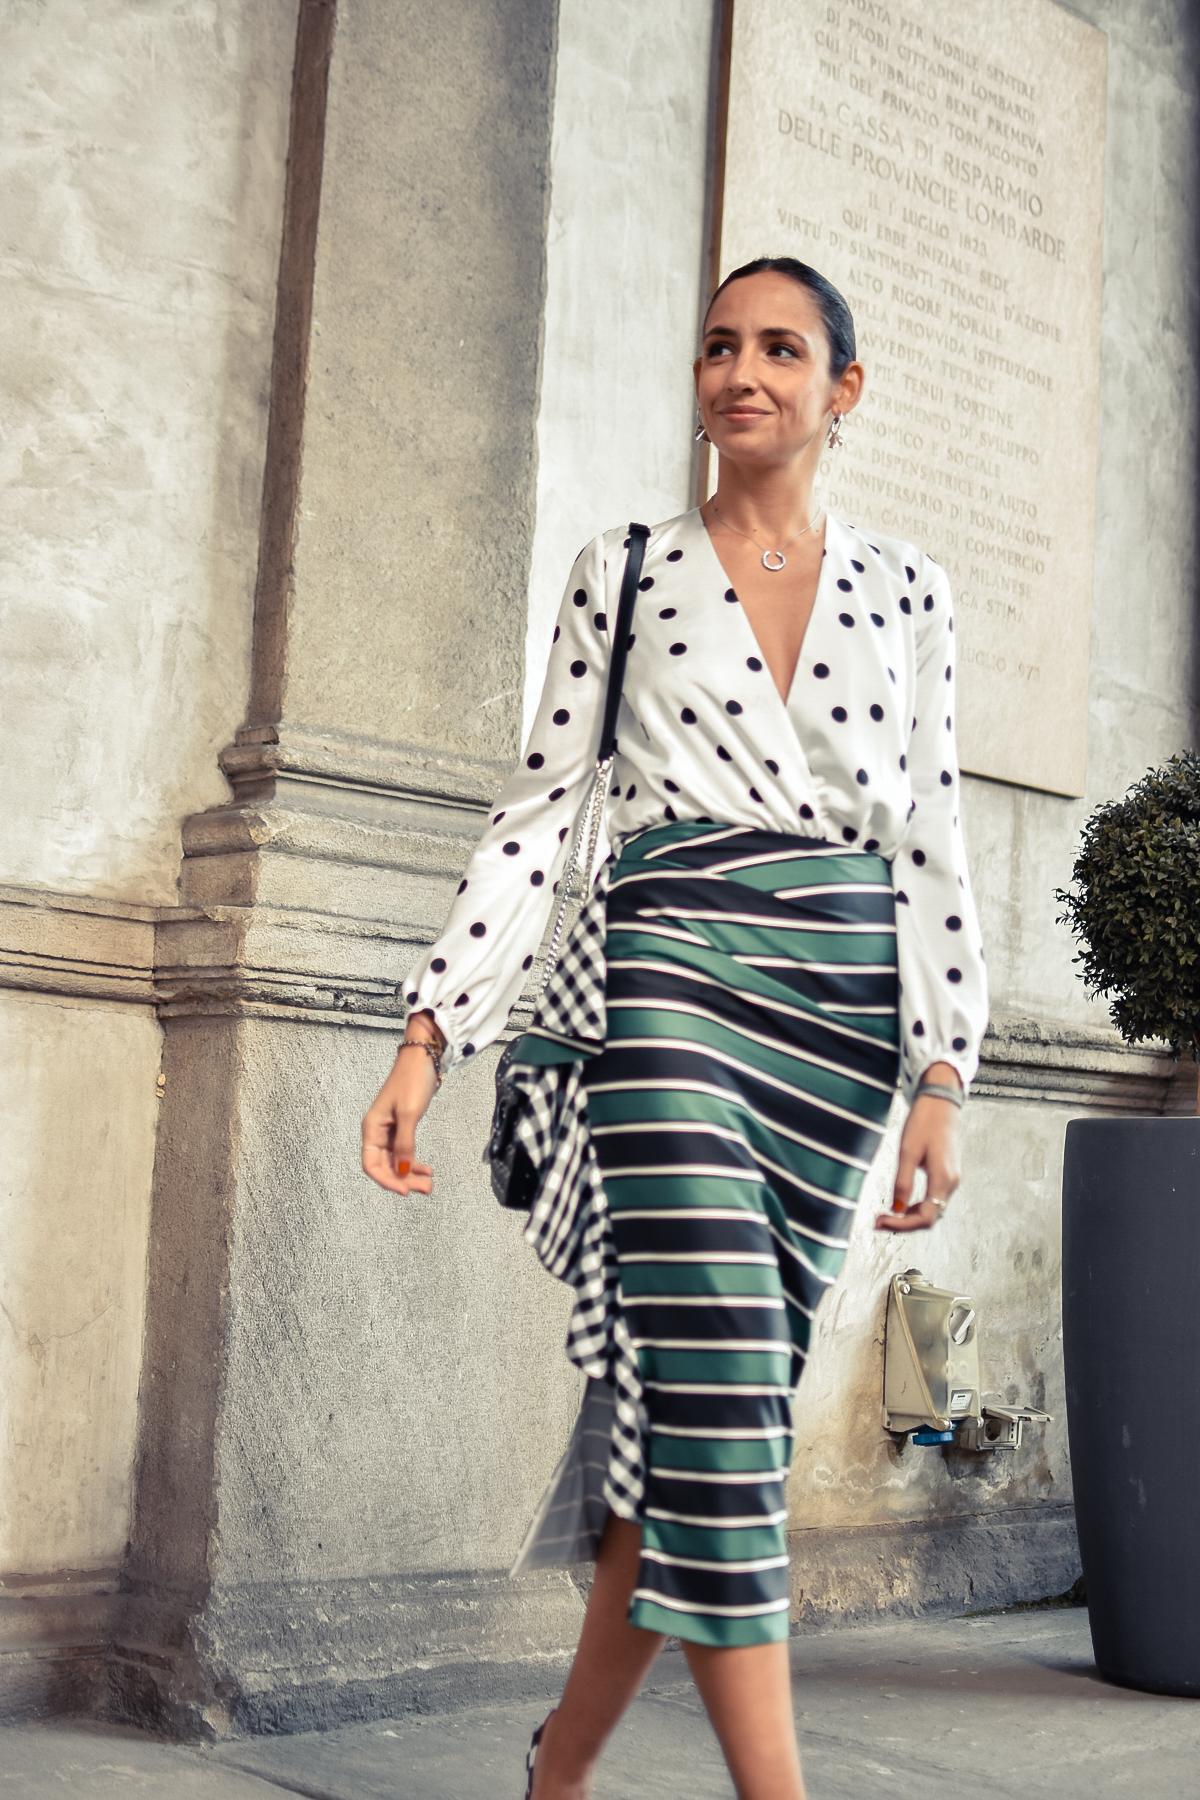 el-blog-de-silvia-mfw-milan-fashion-week-street-style-falda-rayas-manolo-blahnik-09